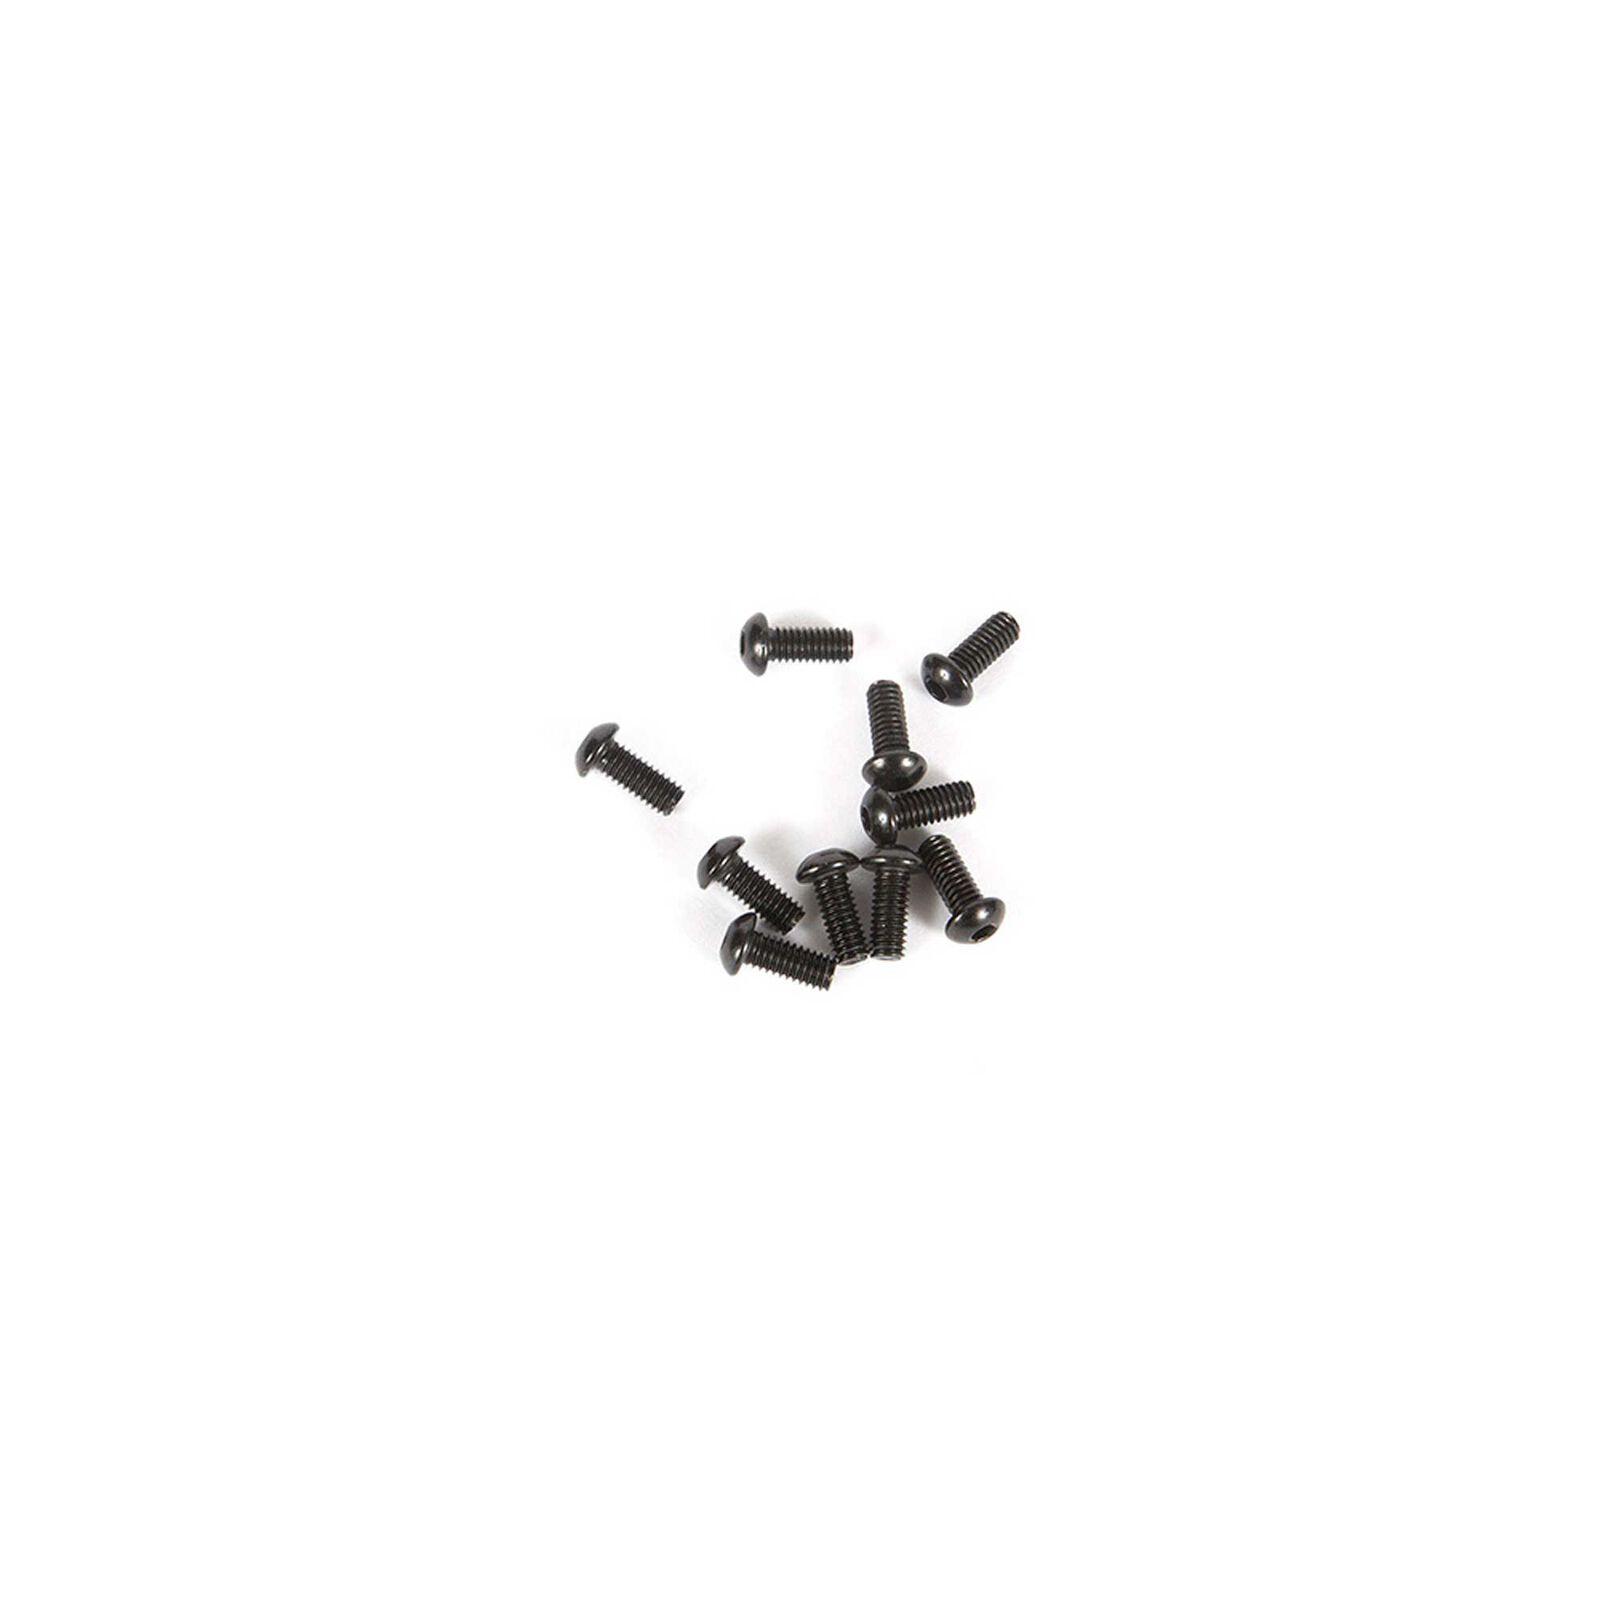 M2.5 x 6mm Button Head Screw (10)